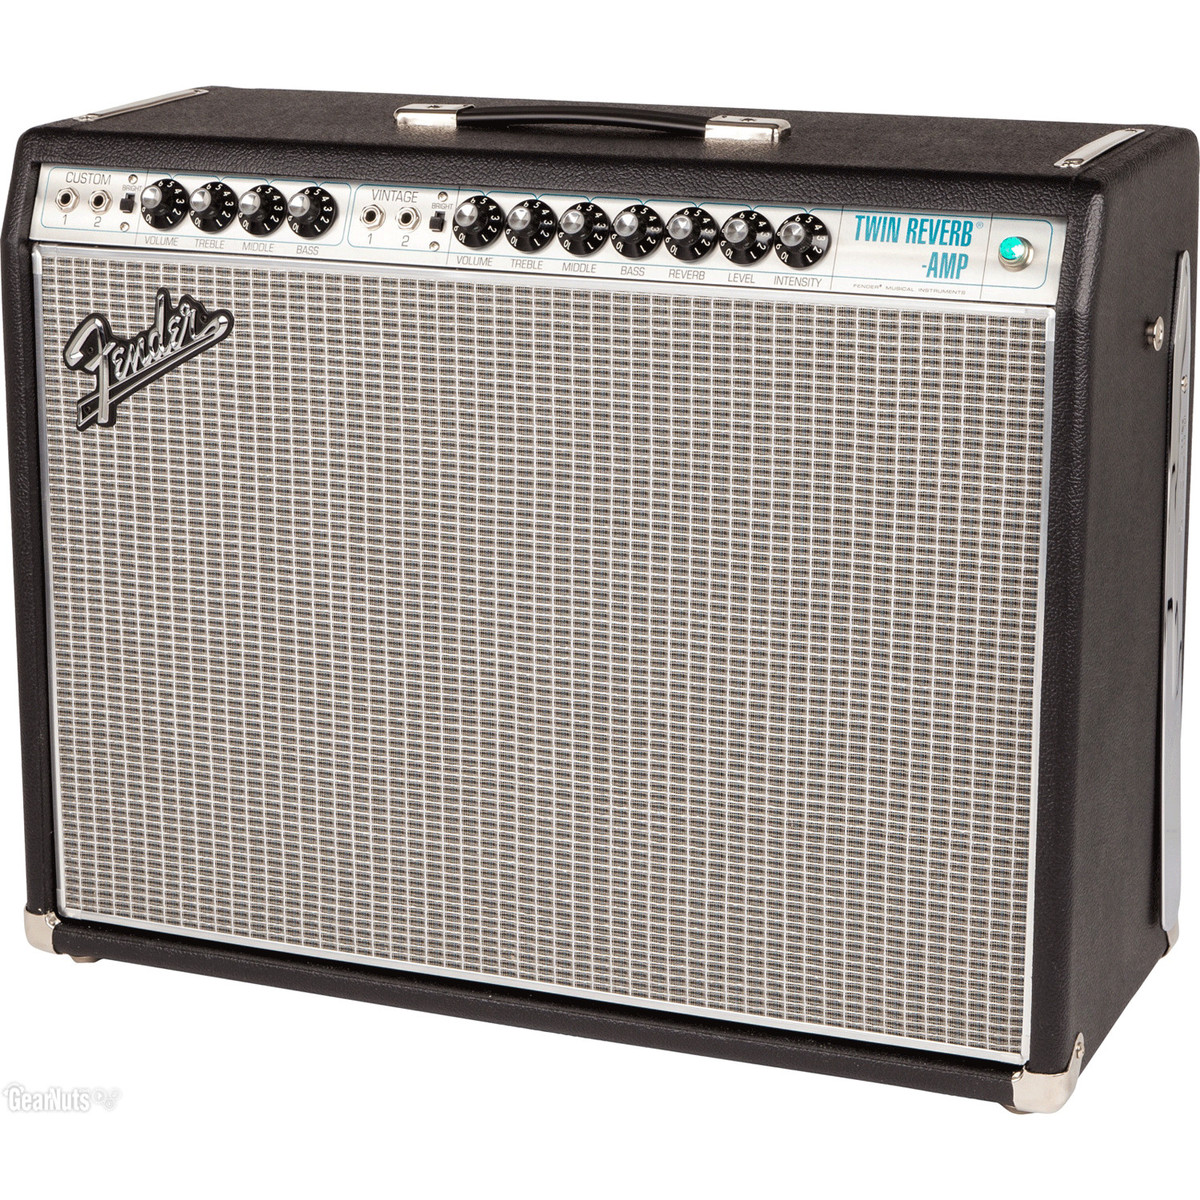 Fender '68 Custom Twin Reverb - B-Stock at Gear4music